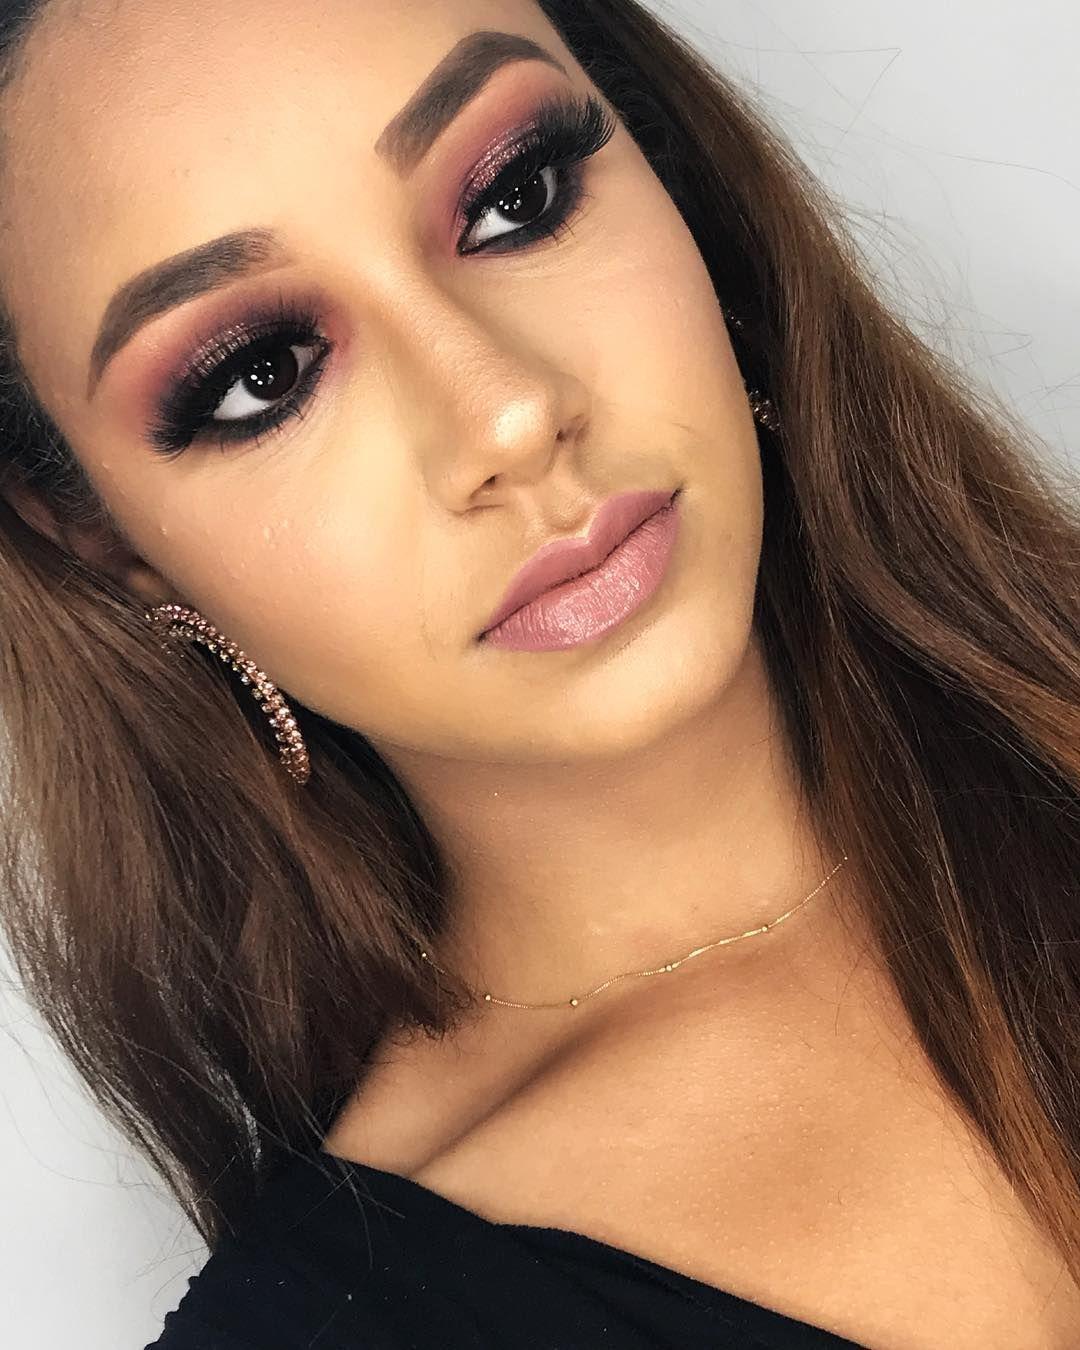 20182019 makeup models makeup Makeup, Models makeup